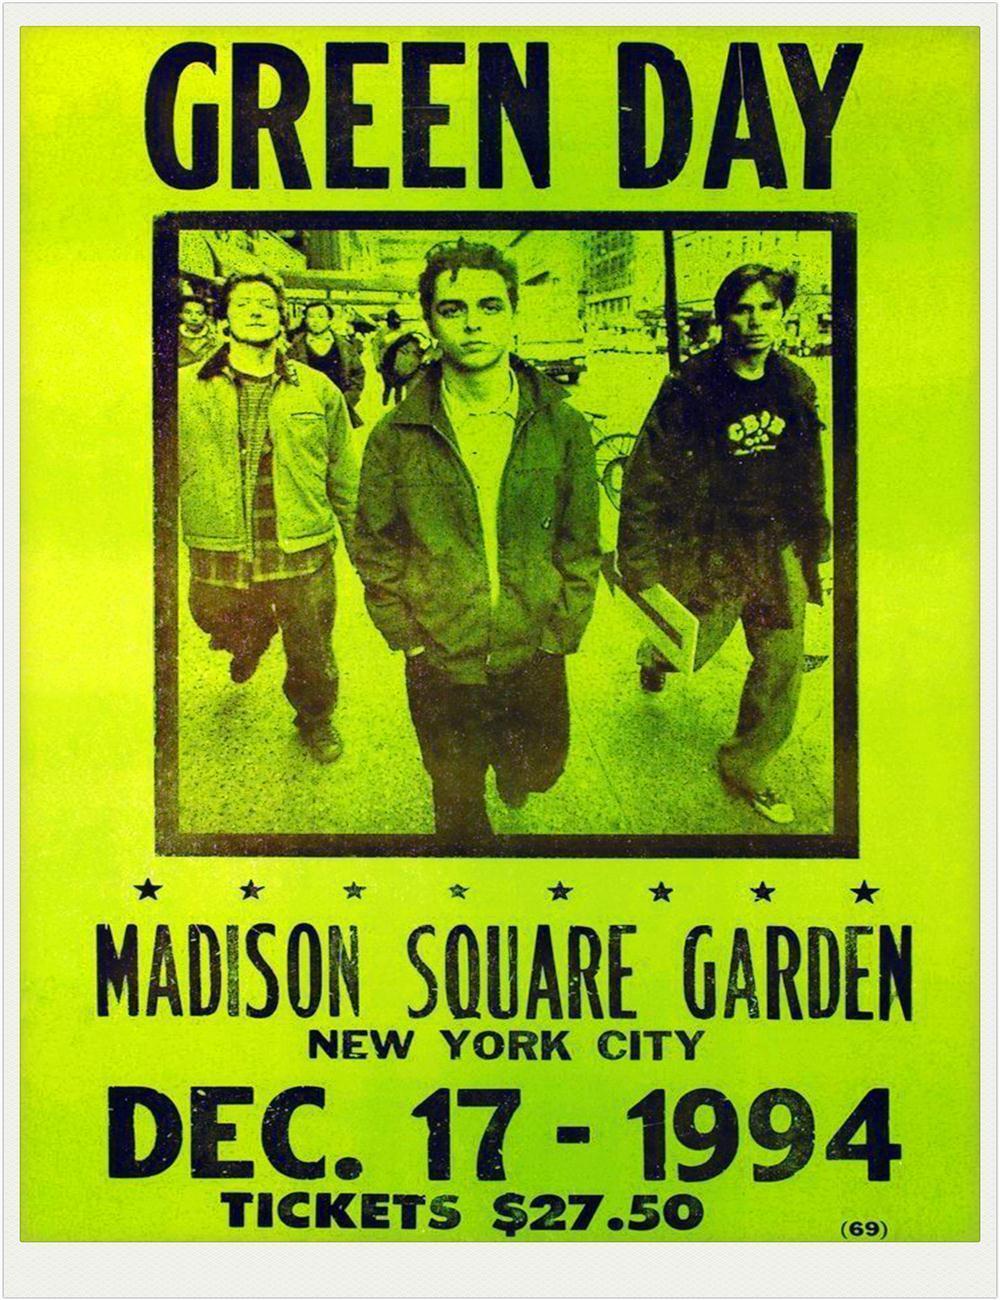 Green day Madison Square Garden 1994 0604 Vintage Music Poster Art